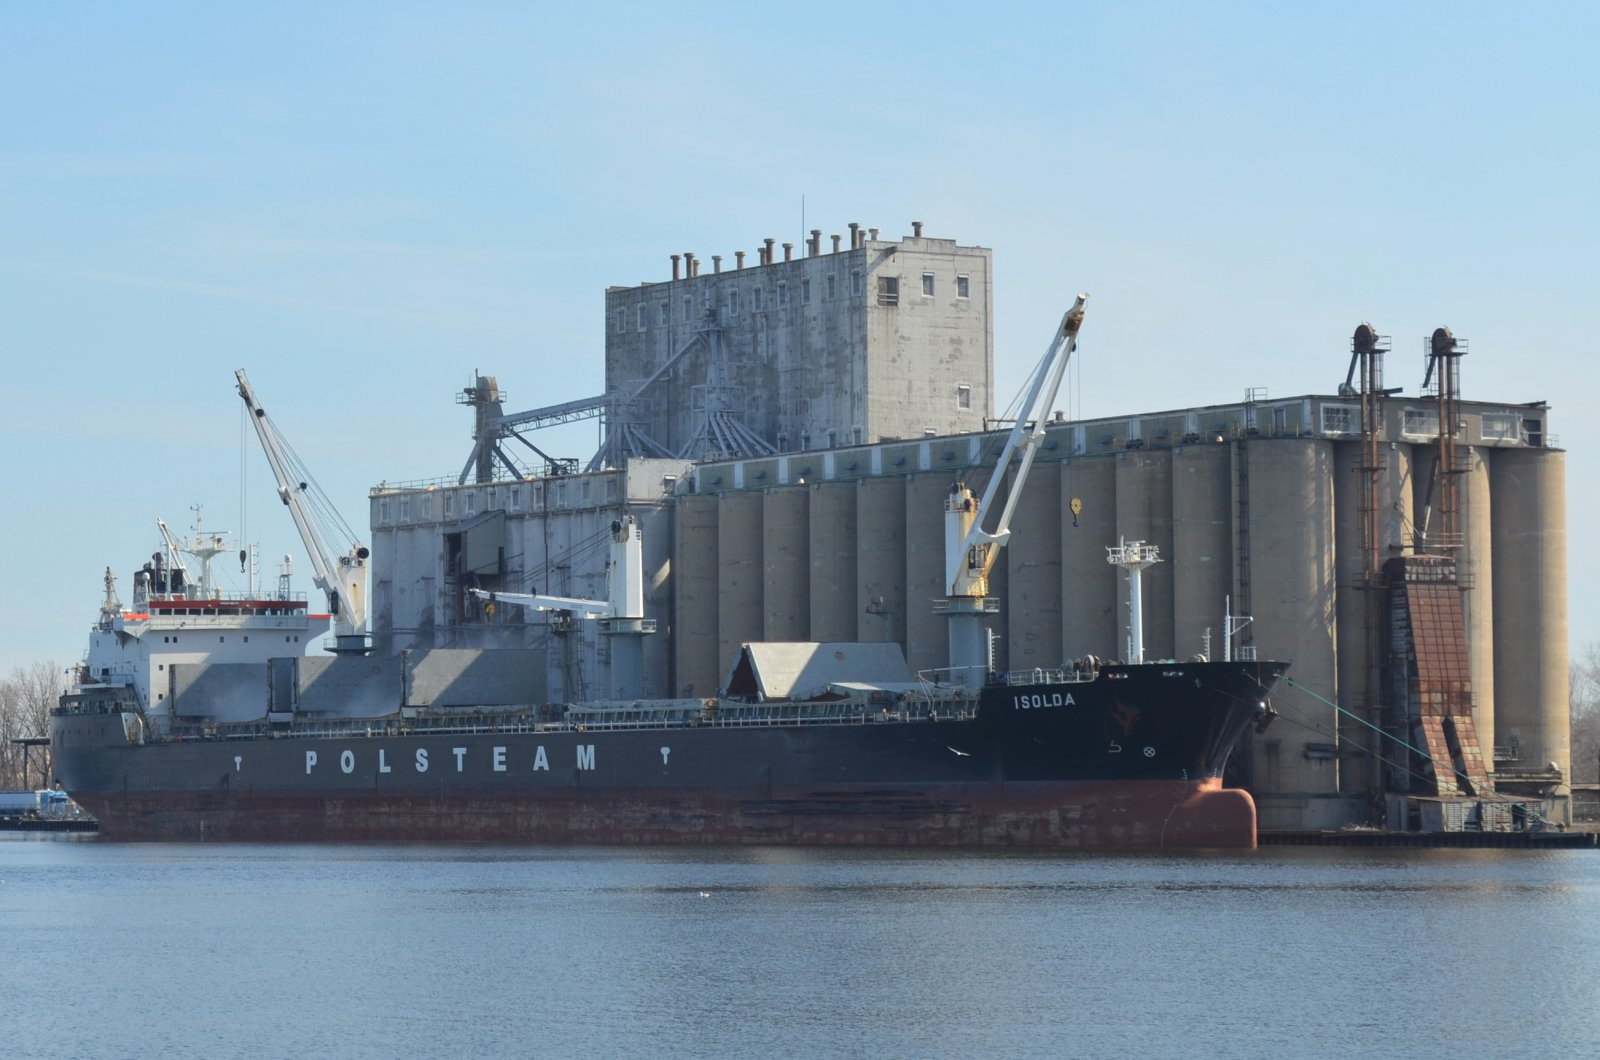 Isolda docks in Milwaukee. Photo by Jack Fennimore.